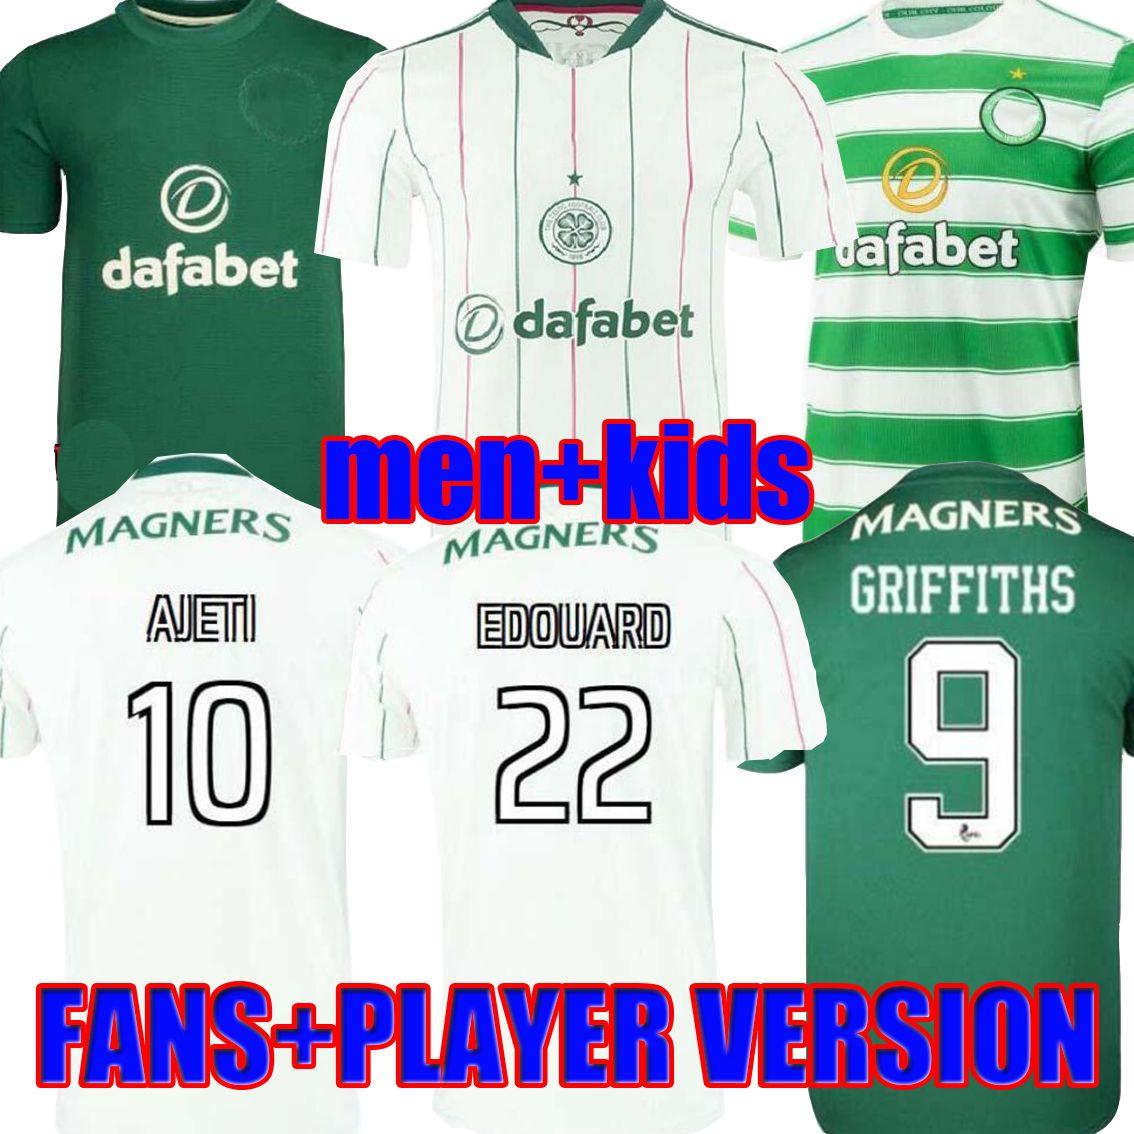 21 22 Celtic AJeti Turnbull Soccer Jerseys 2021 Accueil Vert Edouard Johnston Griffiths McGregor Maillots de pied Foot Forrest Hommes + Chemises de football enfants Uniformes